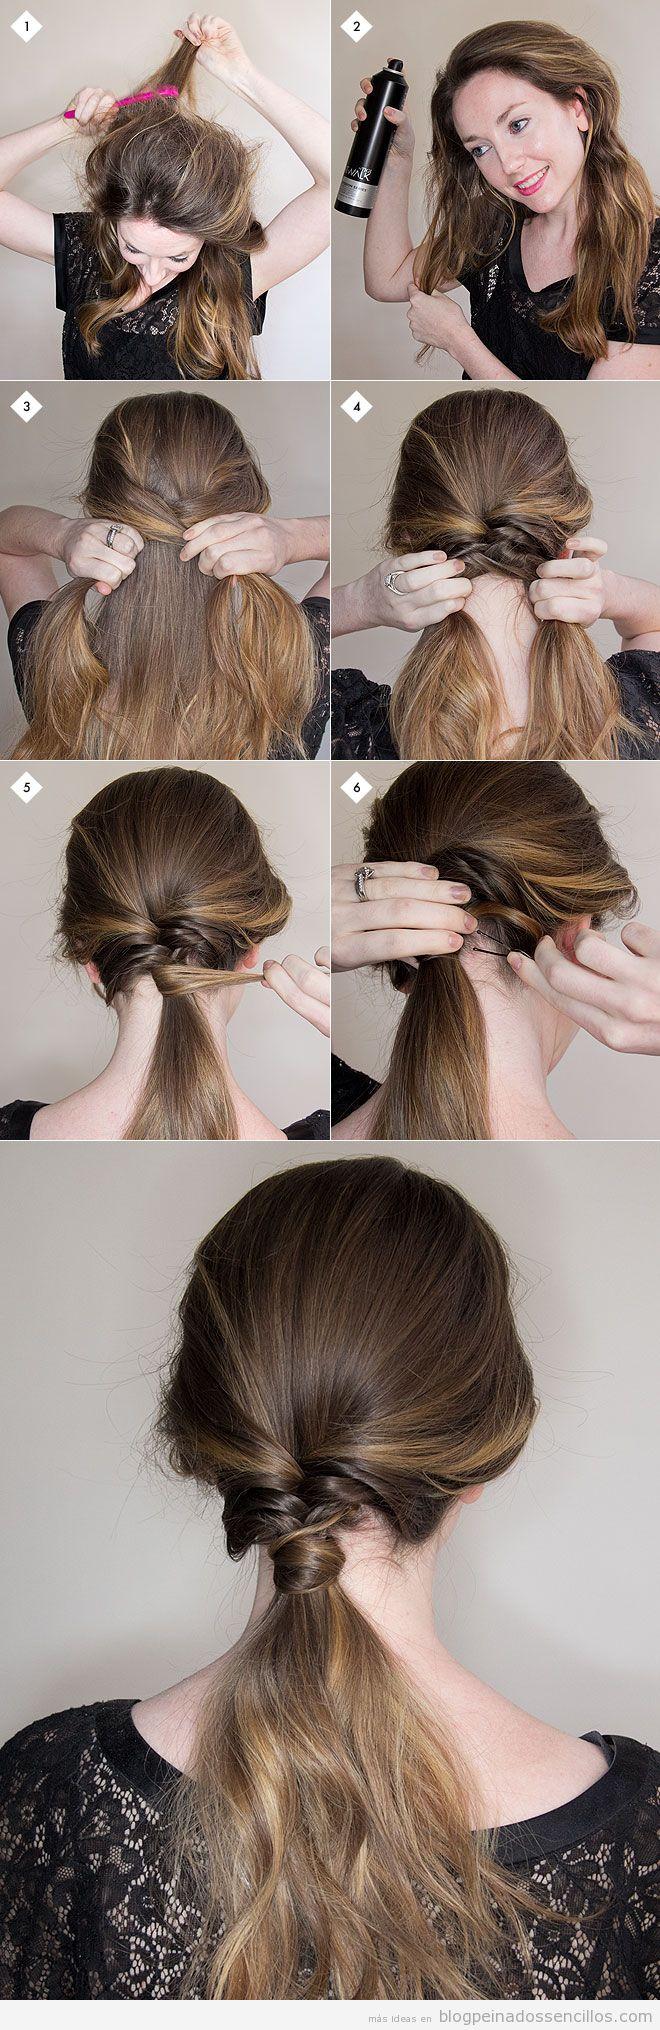 Varios peinados peinados faciles y rapidos paso a paso Colección De Cortes De Pelo Ideas - Peinados paso a paso   Peinados paso a paso, Peinados ...